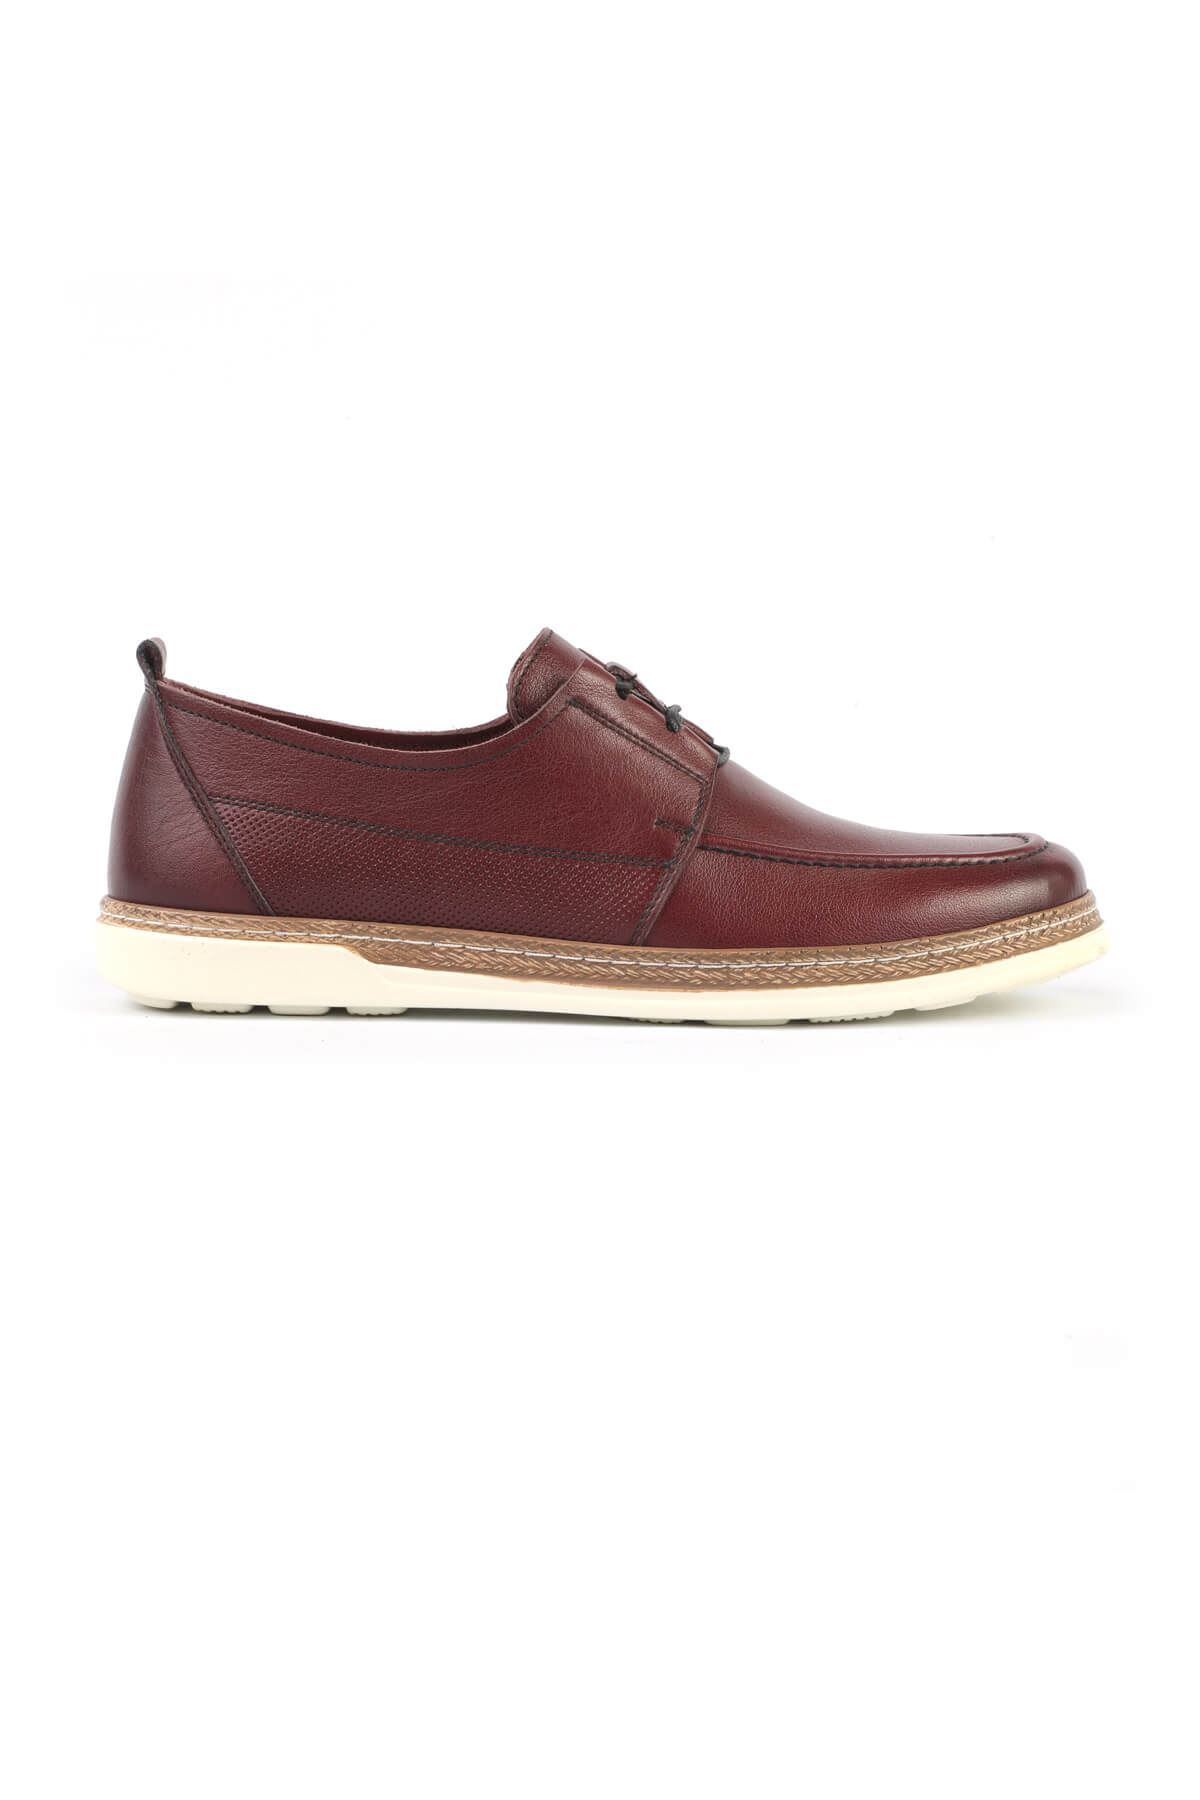 Libero C626 Claret Red Casual Shoes